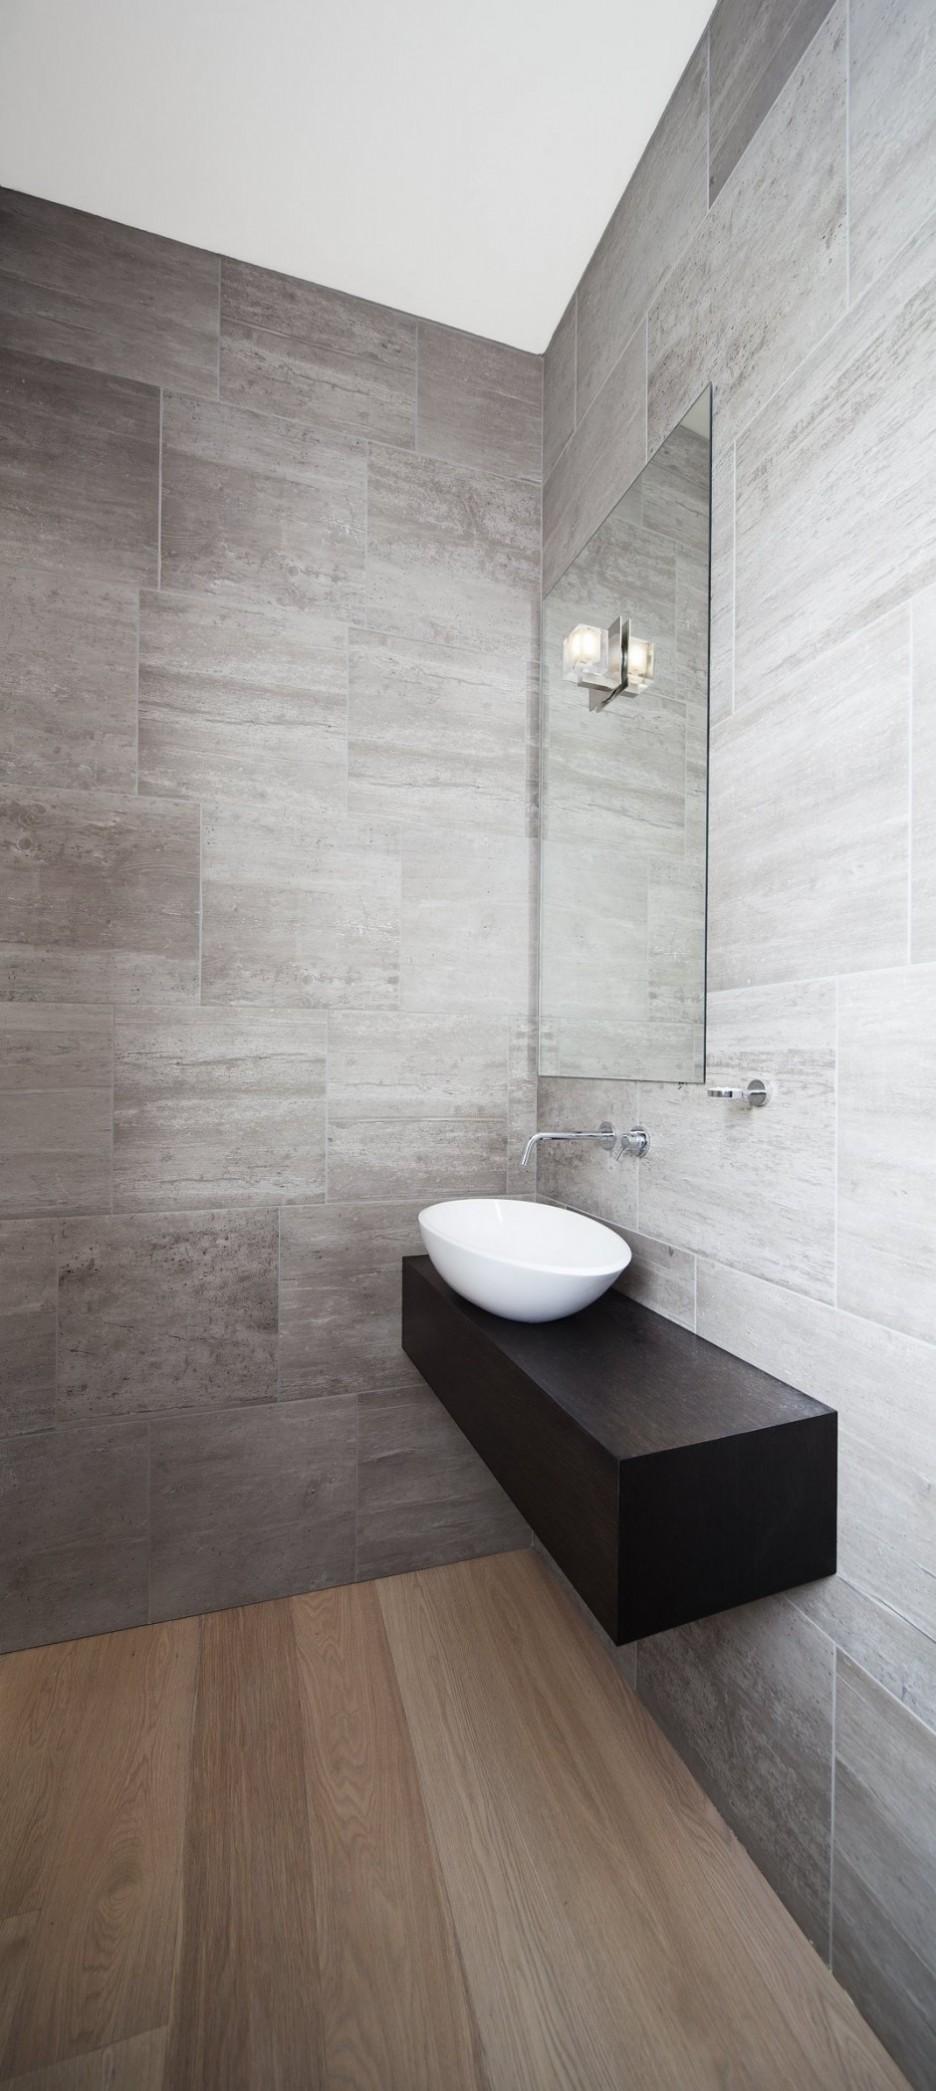 Wonderful Grey Painted Master Bathroom Interior Idea With Wooden